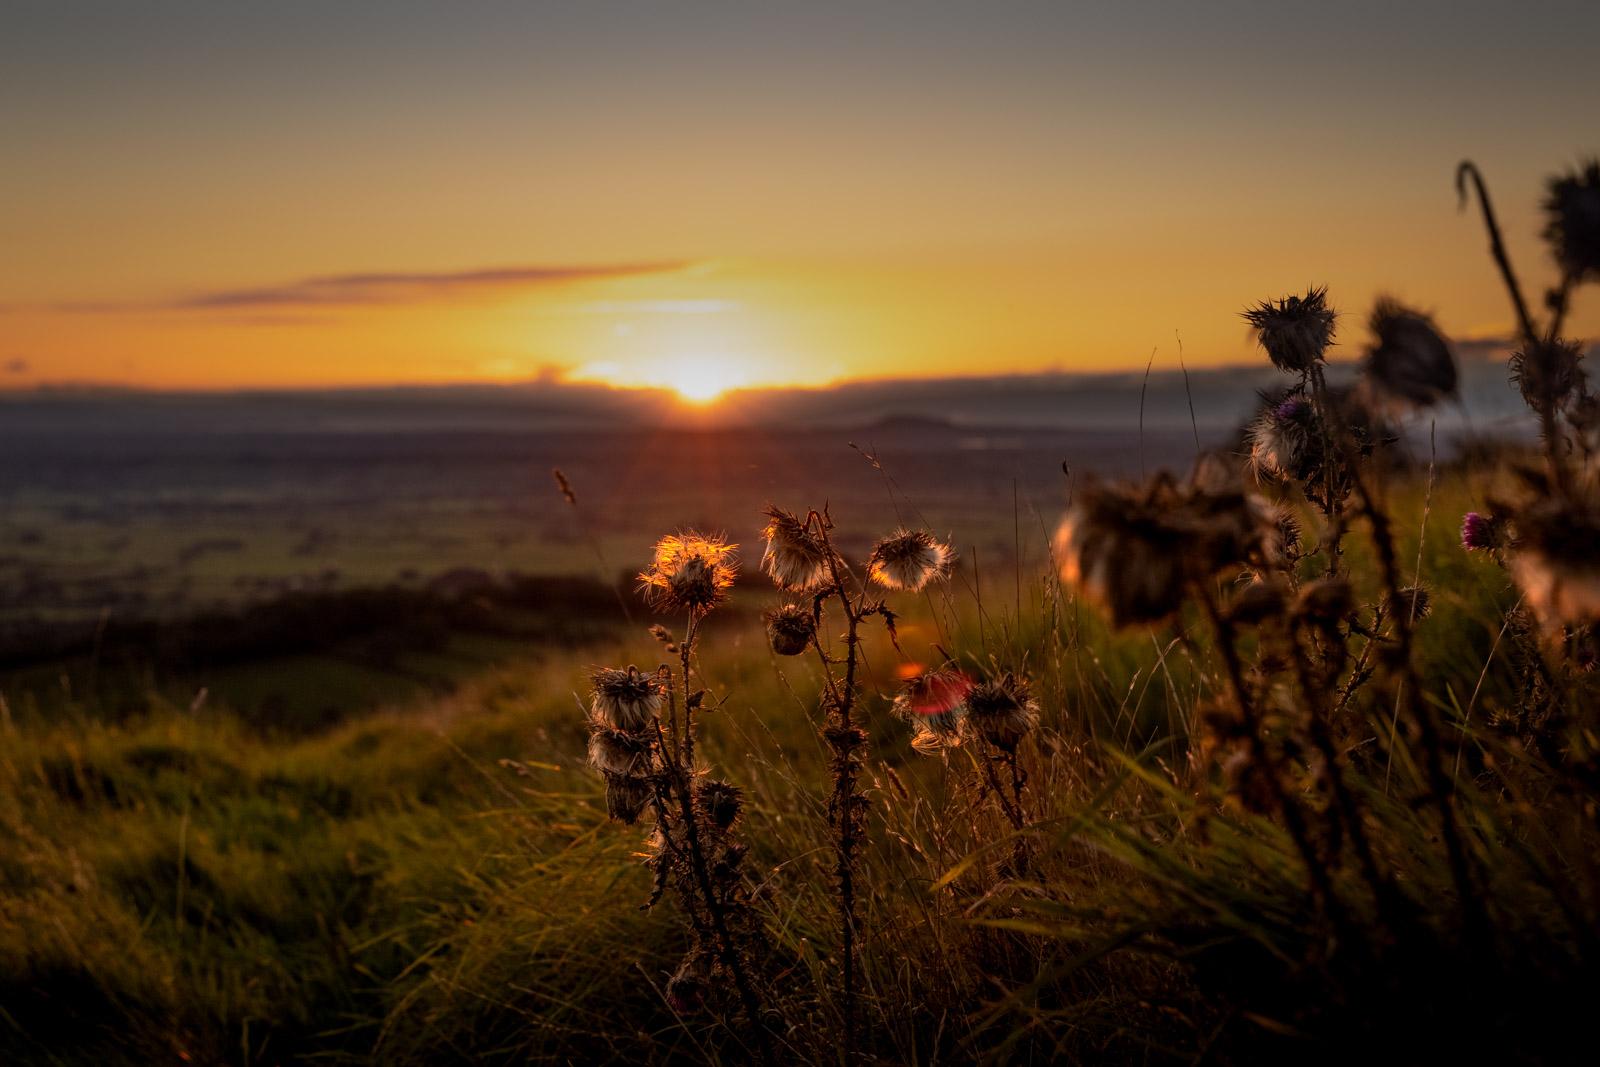 Autumn Equinox - Lynchcombe, Mendip Hills, Somerset, UK. ID BR57509